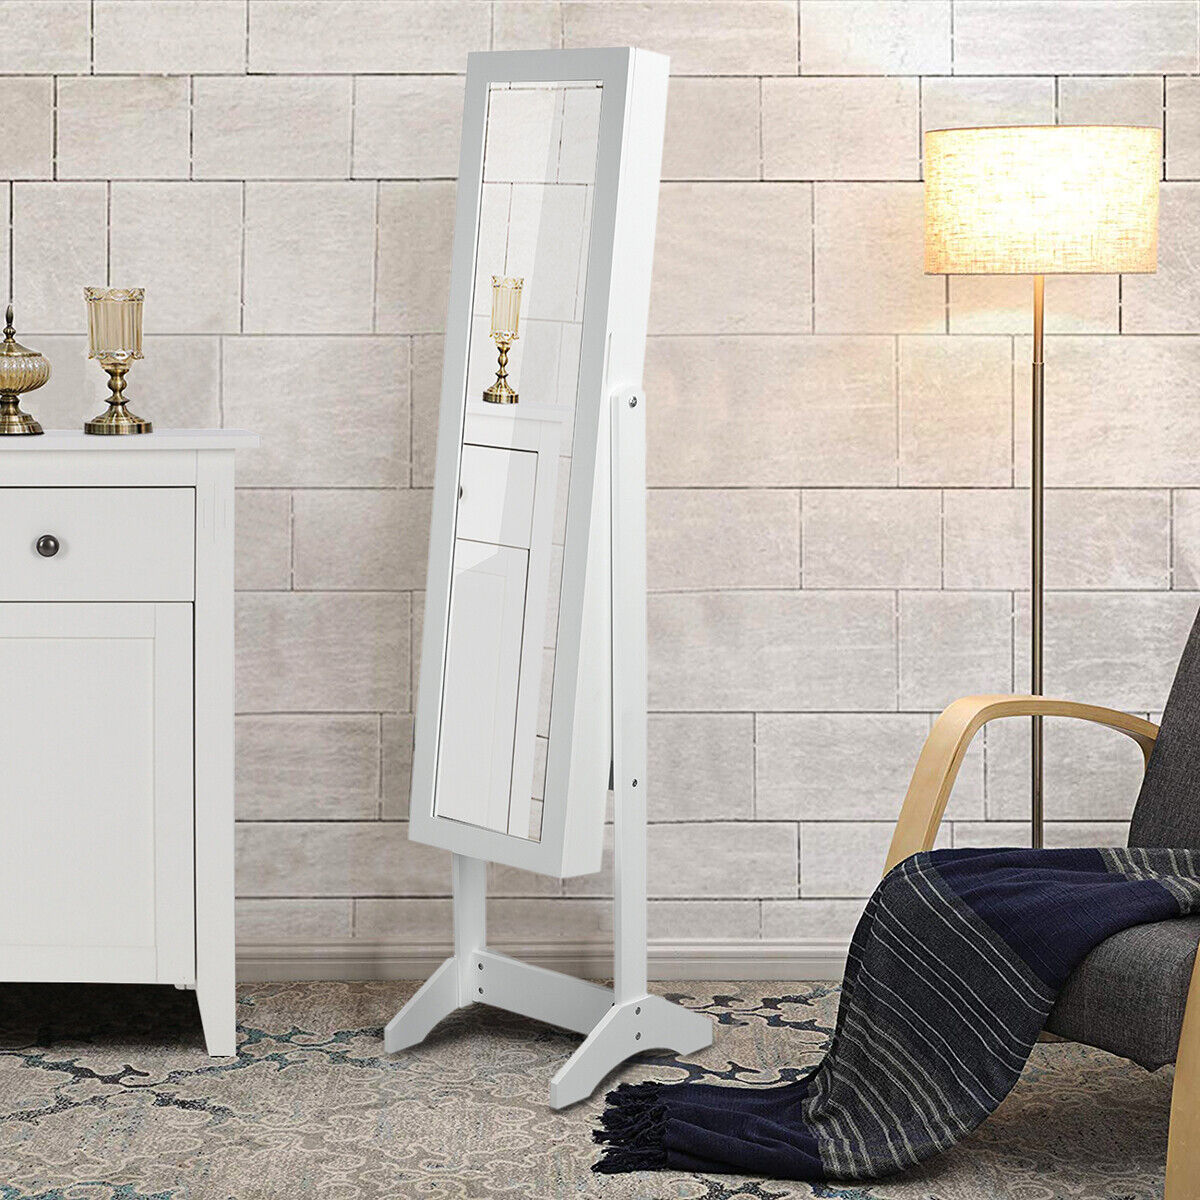 Jewelry Stoarge Cabinet Full Body Mirror Freestanding Storag